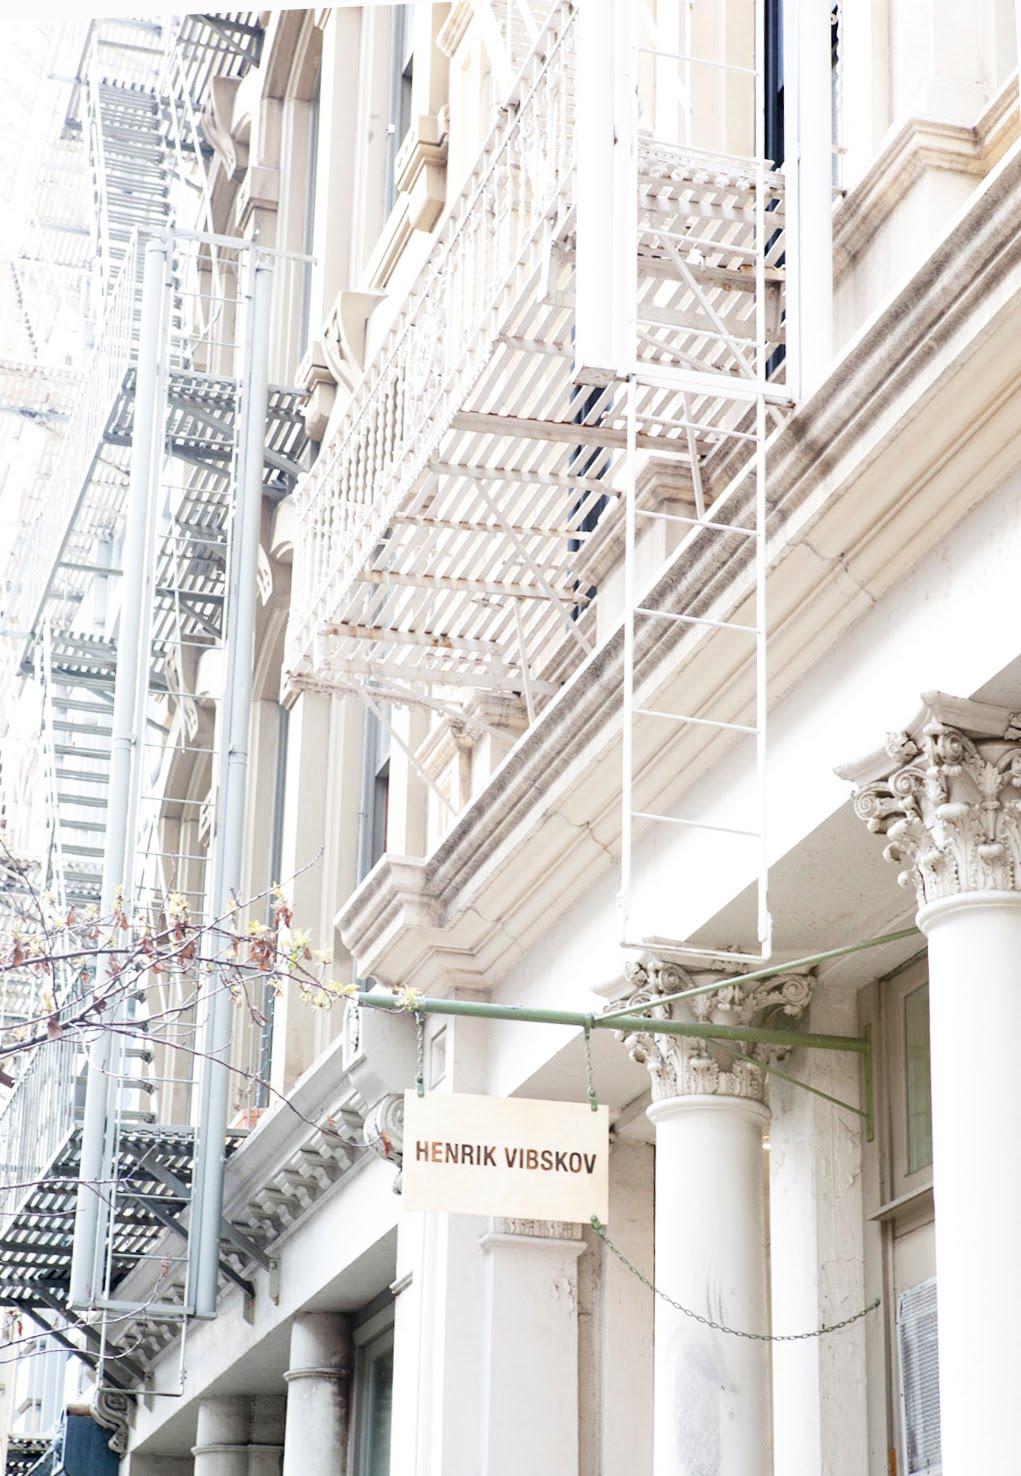 Henrik Vibskov New York boutique